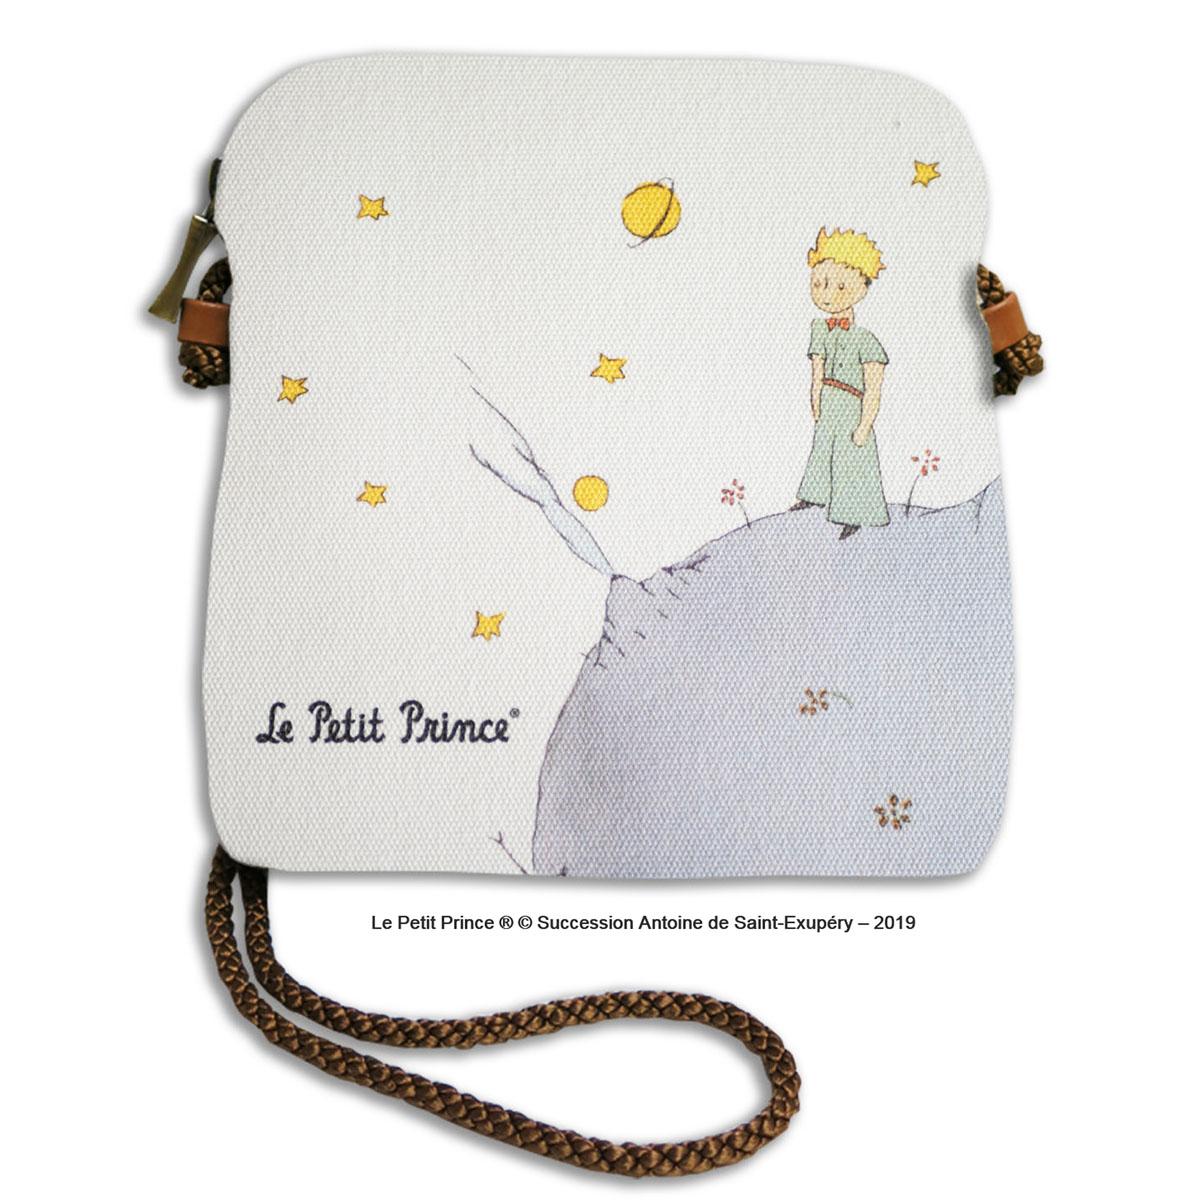 Sac bandoulière artisanal \'Le Petit Prince\' (planete)  - 18x17 cm - [R0455]